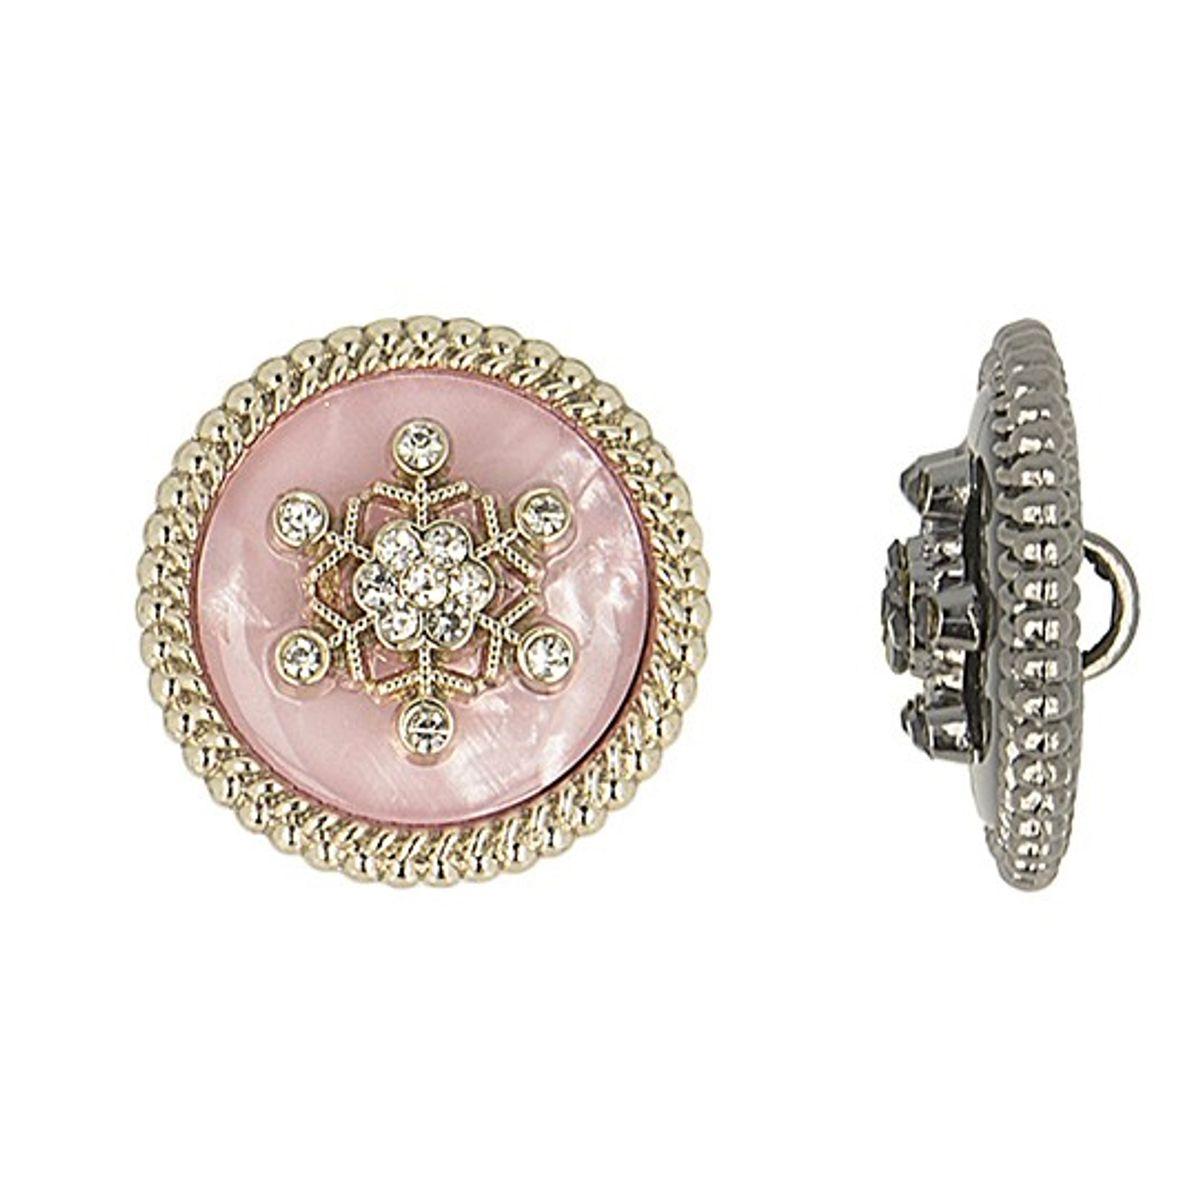 Bouton métal flocon de neige strass - Rose